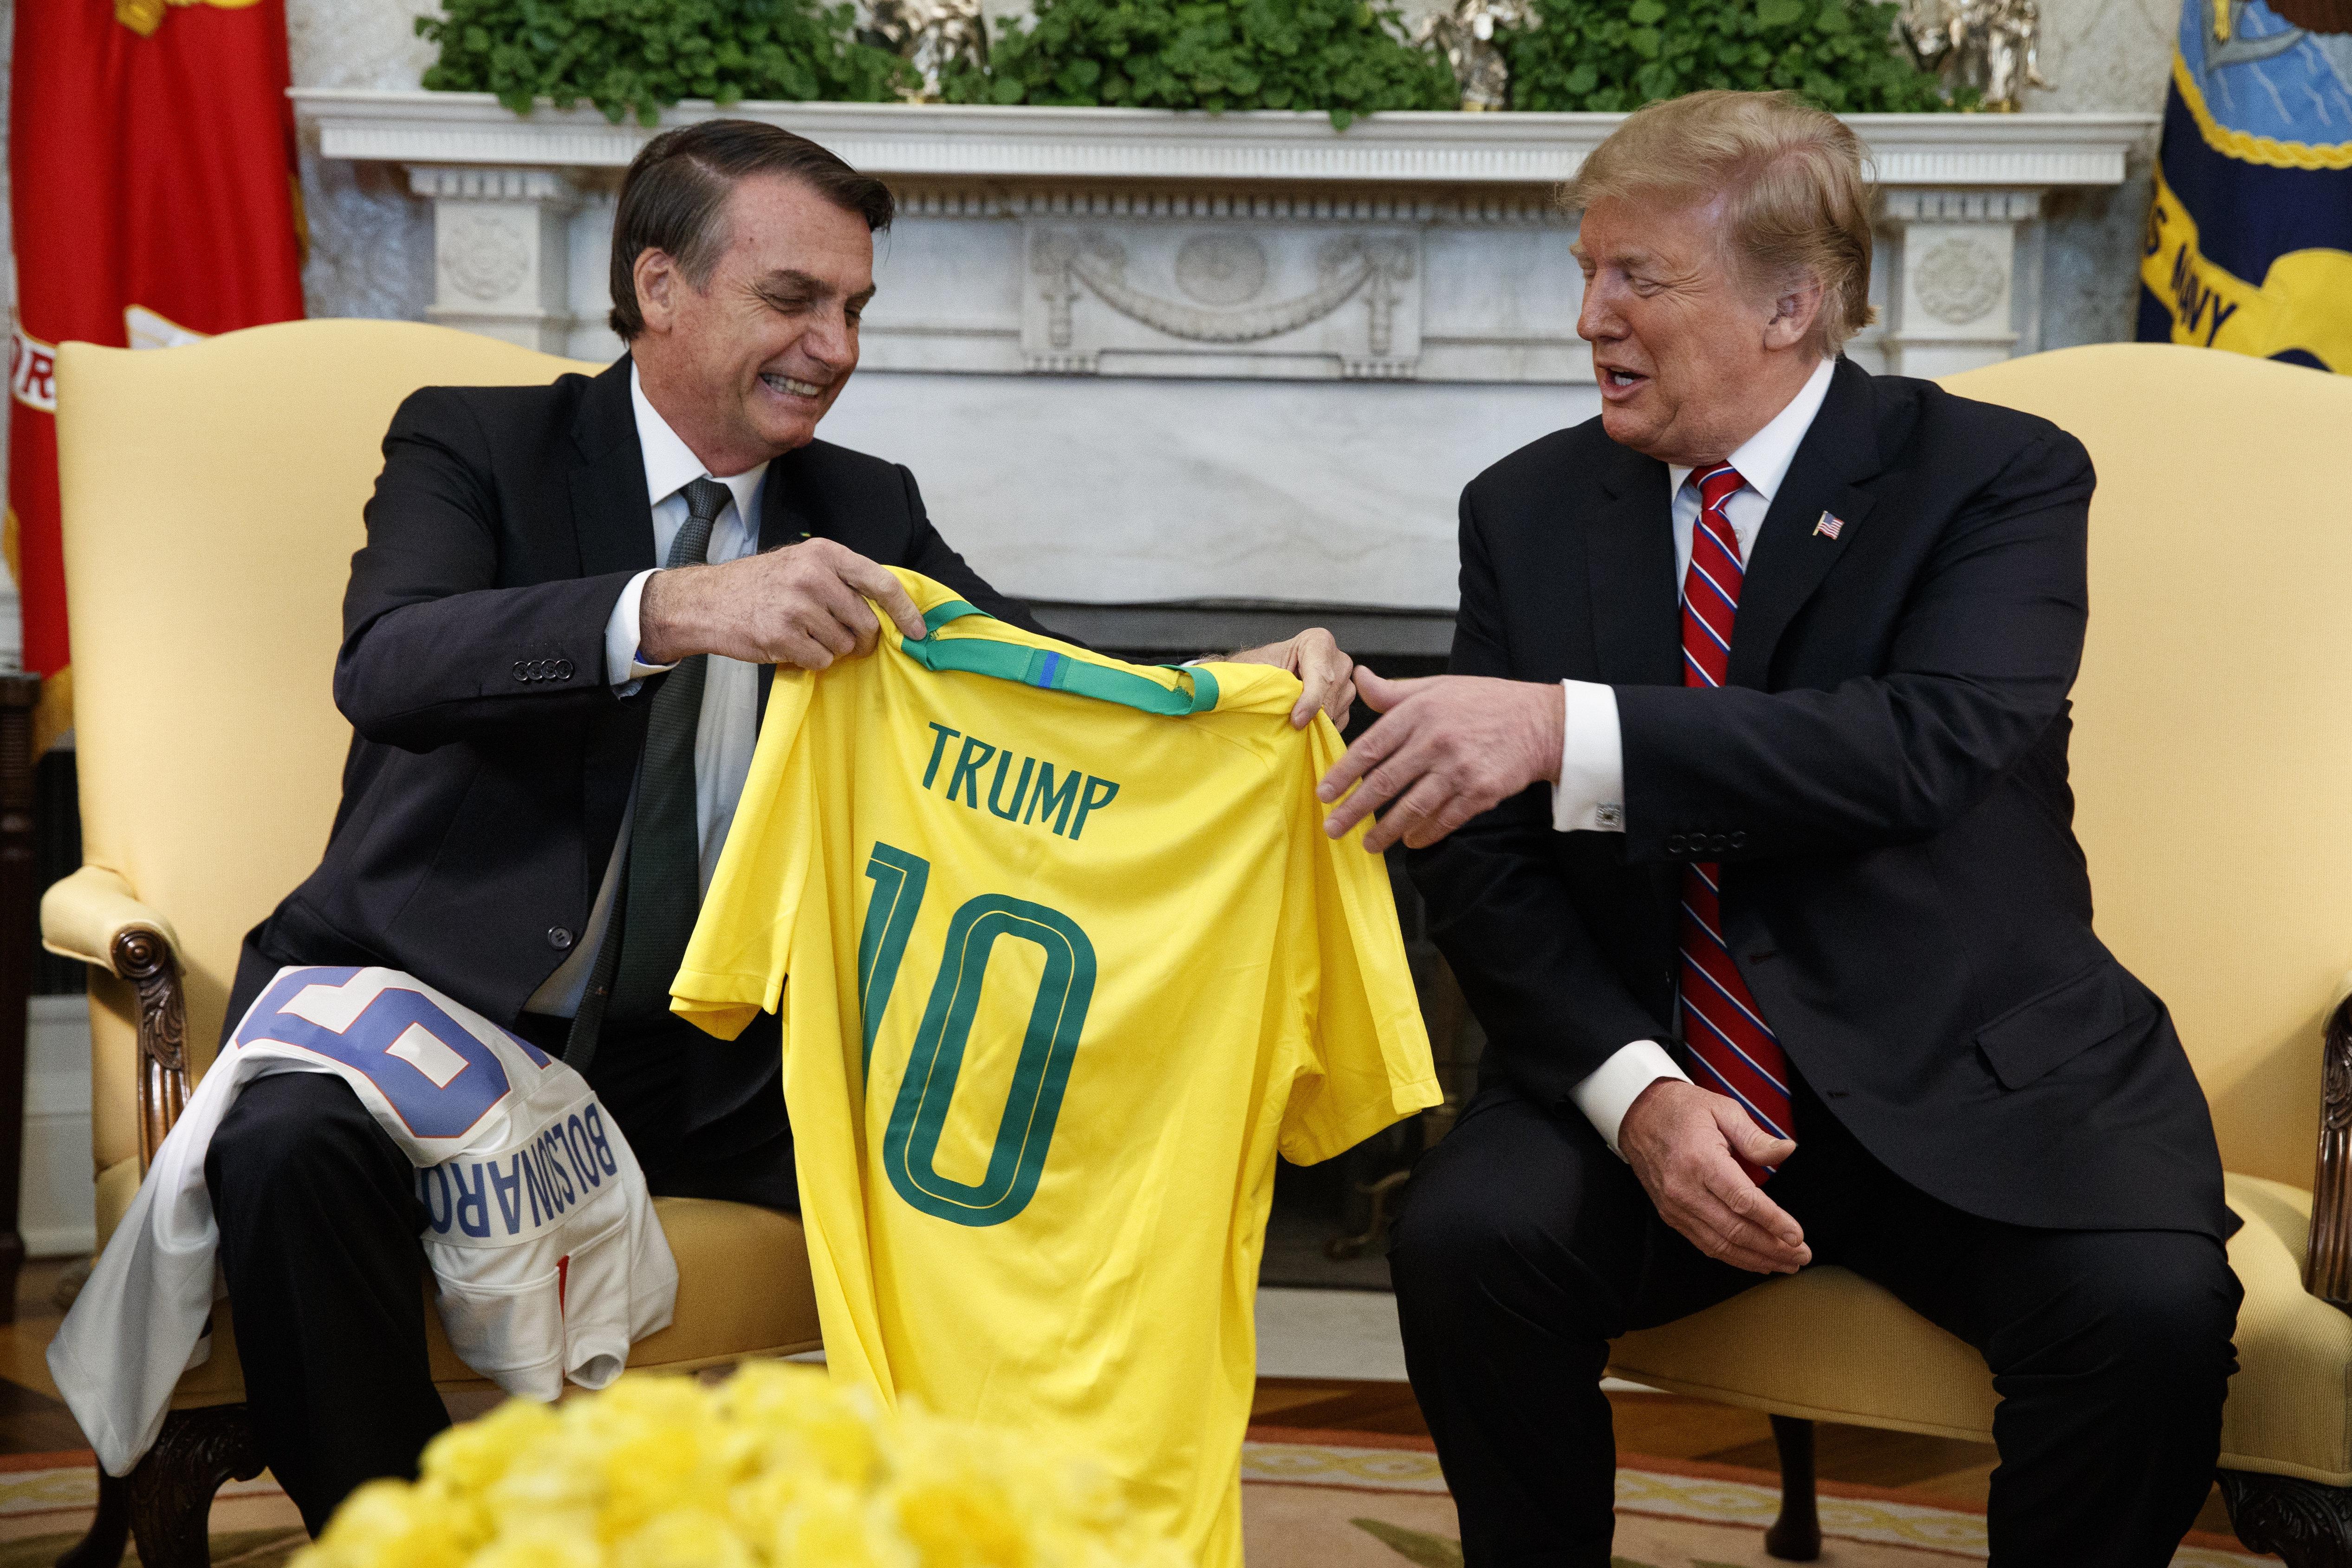 Trump promete a Bolsonaro apoio à entrada do Brasil na